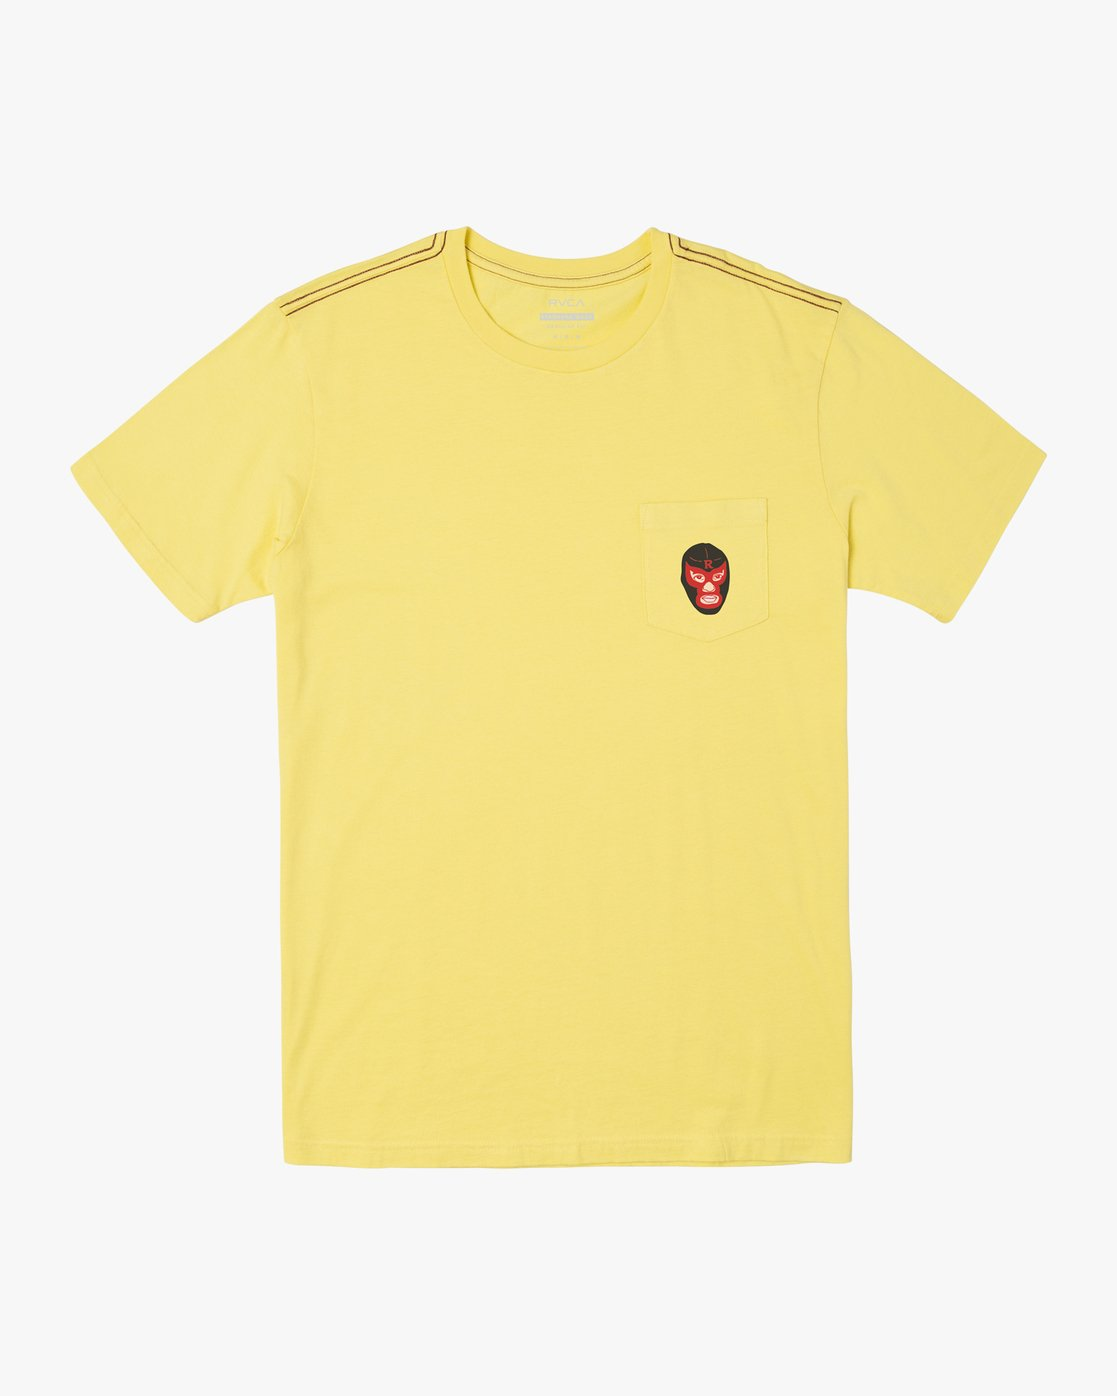 0 LUCHADOR SHORT SLEEVE T-SHIRT Yellow M4362RLU RVCA